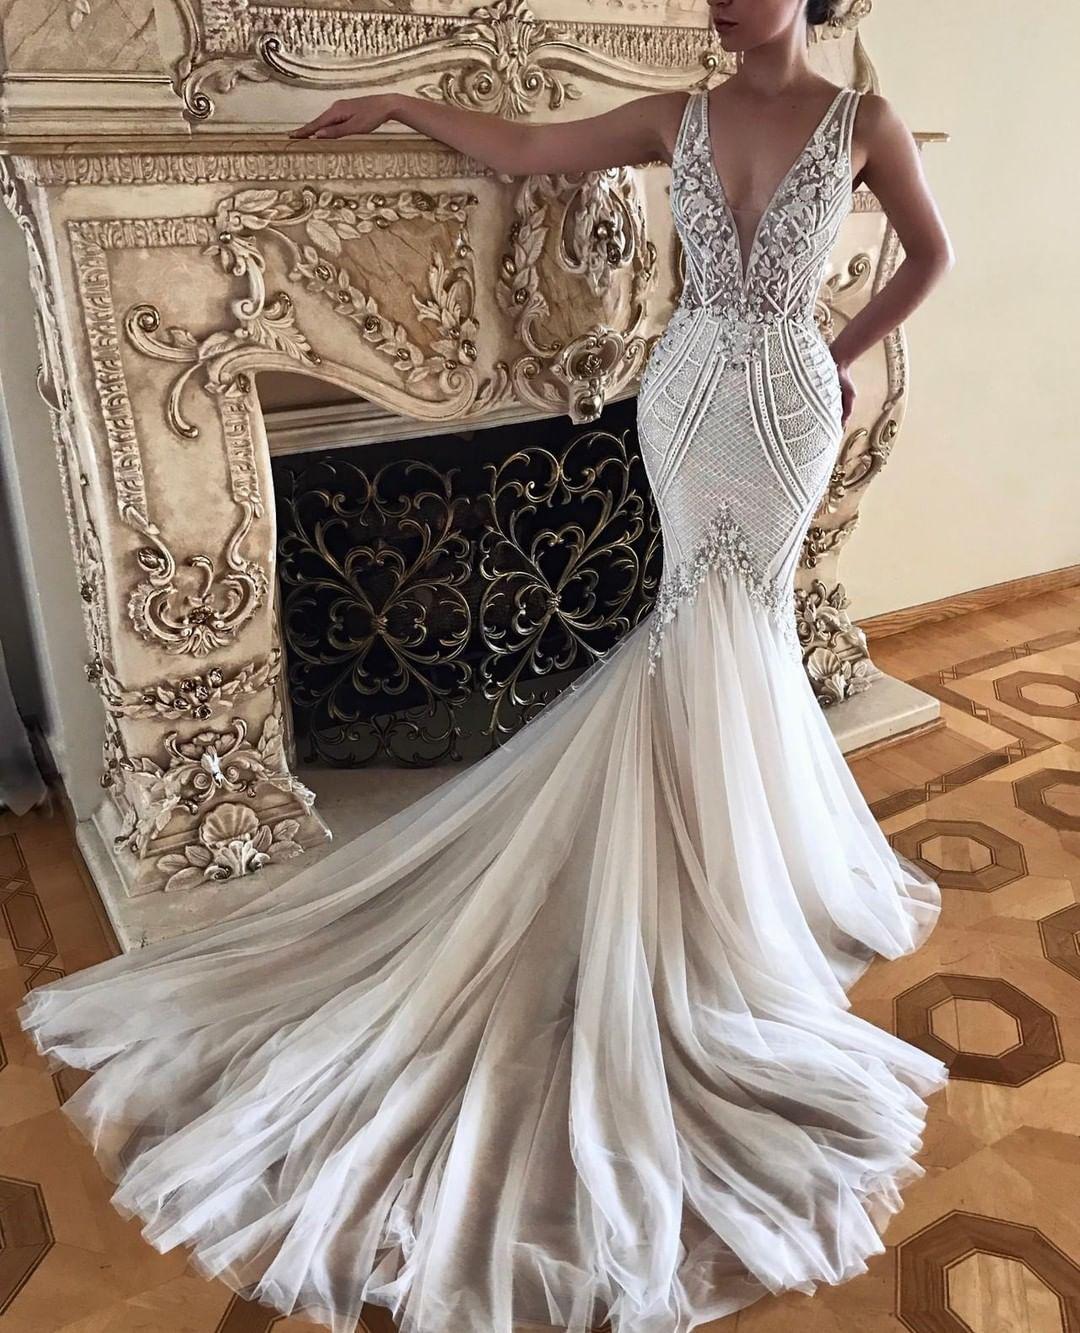 Badgley Mischka Bride On Instagram The Gorgeous Charlize Gown Via Arsine Karoz Badgley Mischka Bridal Badgley Mischka Wedding Dress 1920s Wedding Dress,Wedding Dresses With Deep V Neck